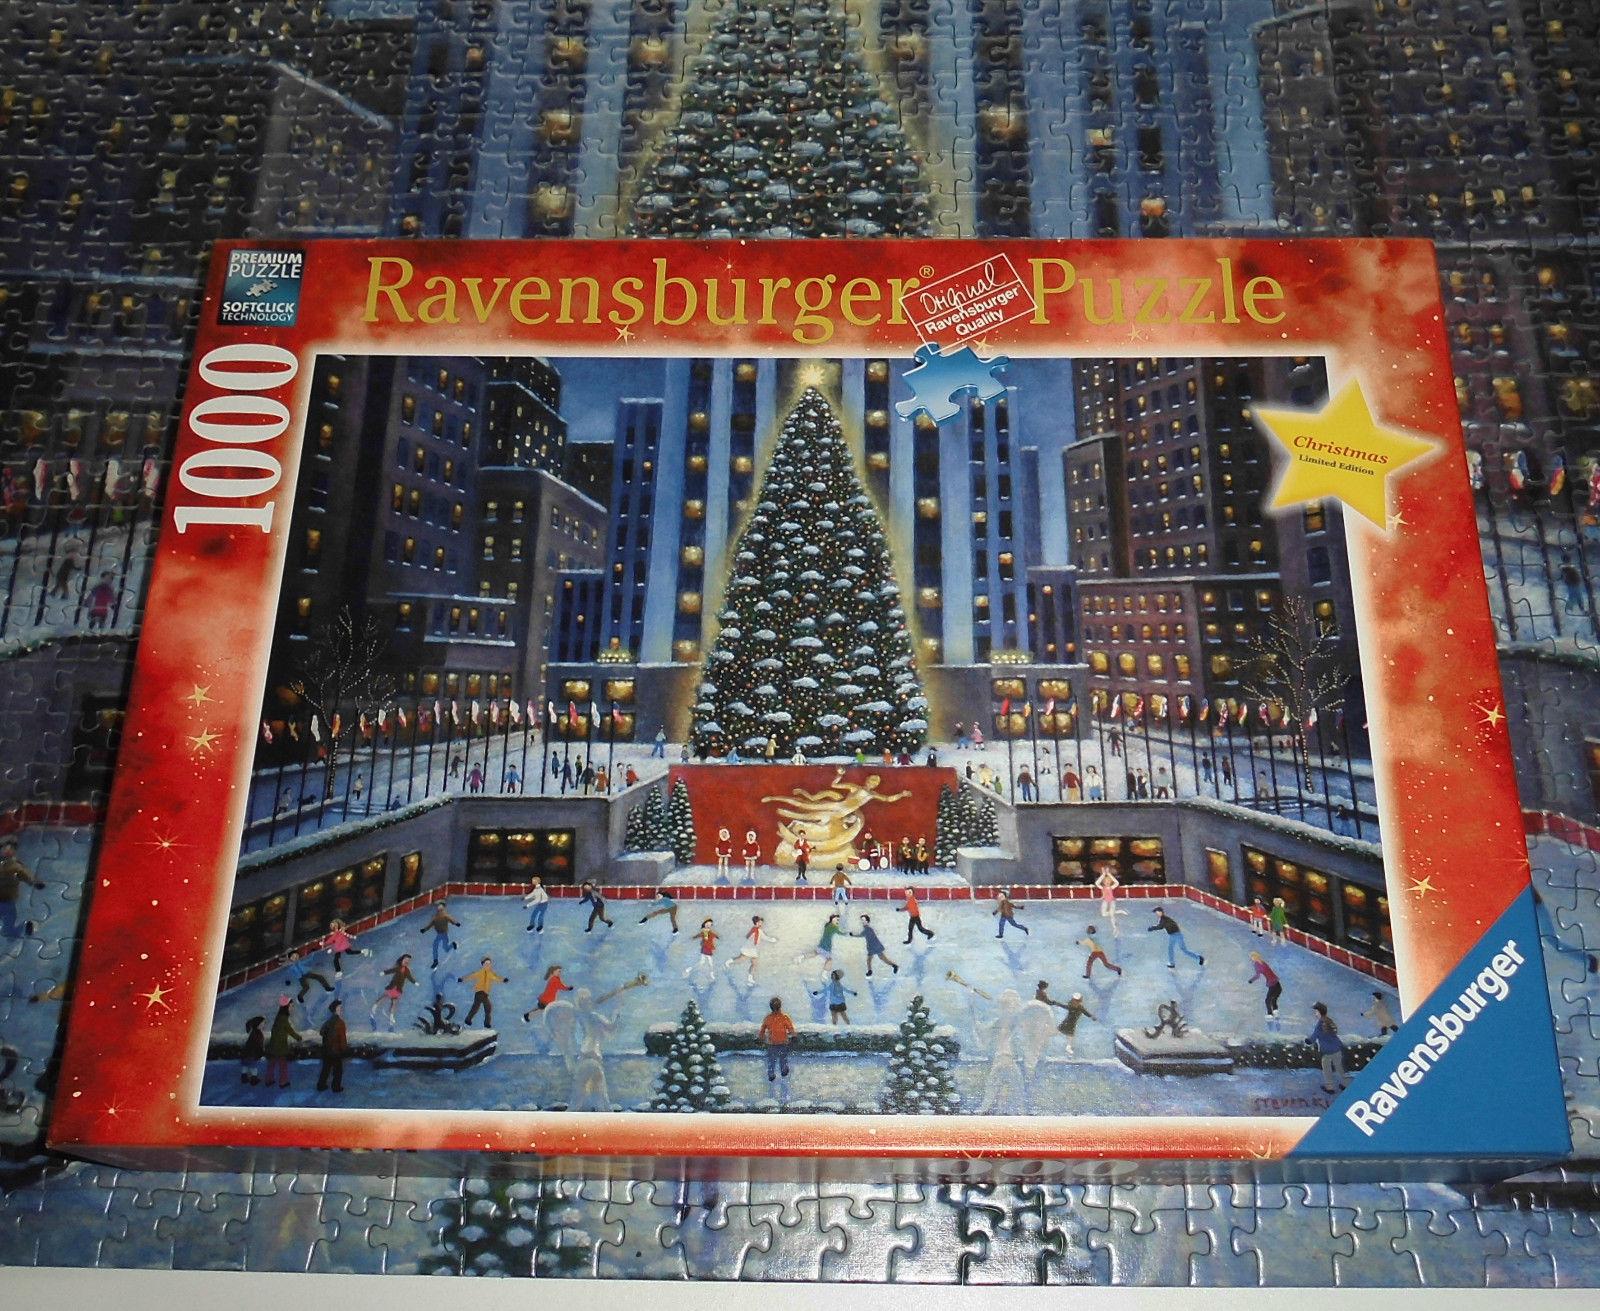 Ravensburger Weihnachtspuzzle 1000 Teile, Christmas NY limited Editon selten rar